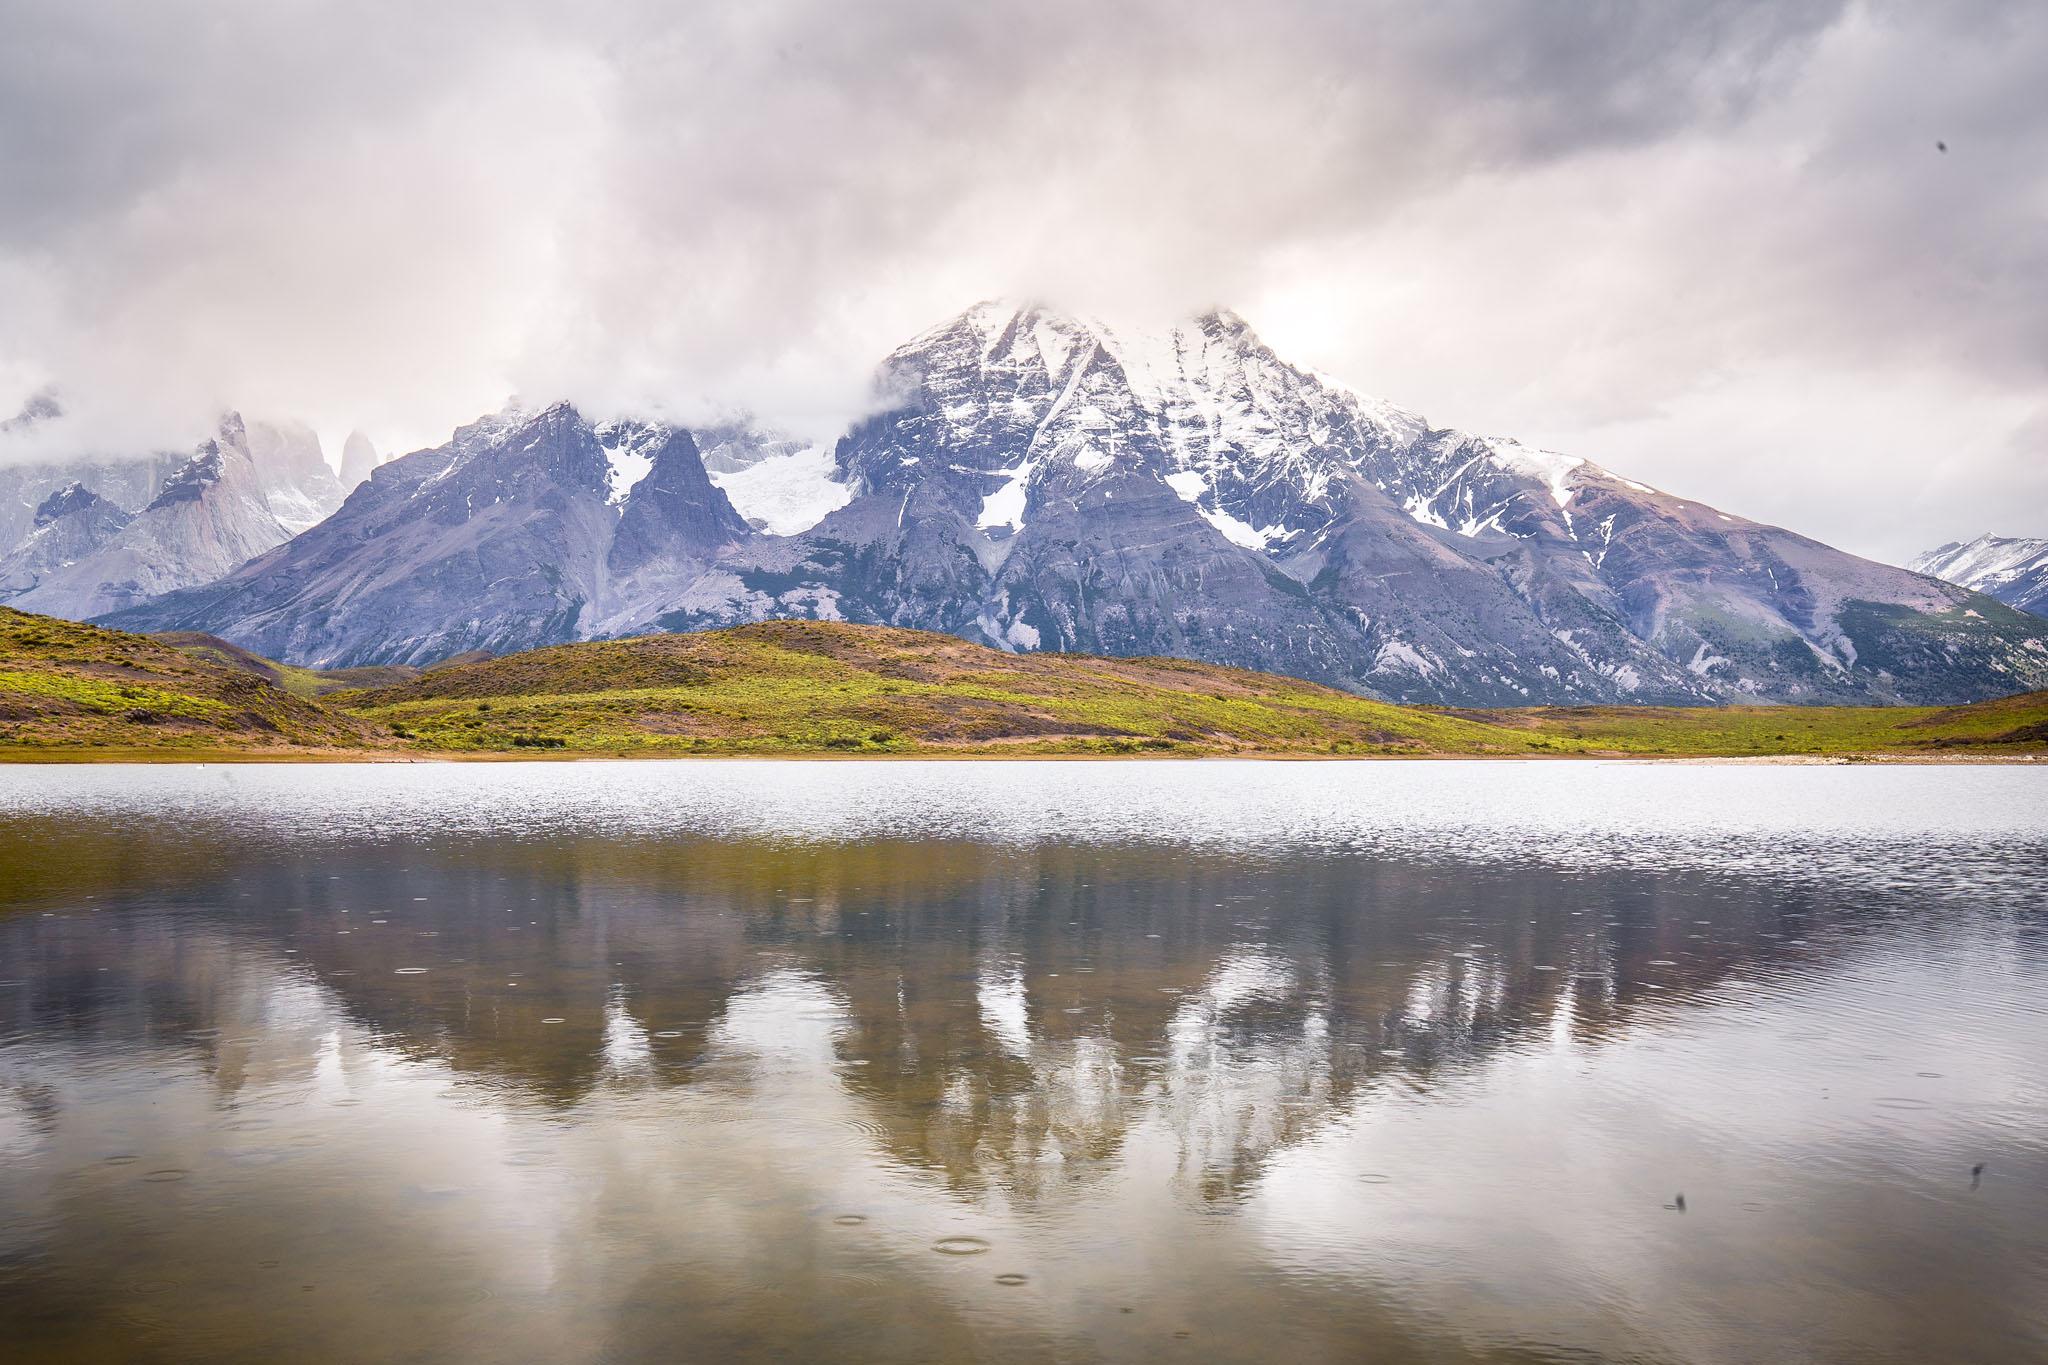 Wedding-Travellers-Overlanding-Destination-Wedding-Chile-Torres-del-Paine-rain-laguna-lake-azul